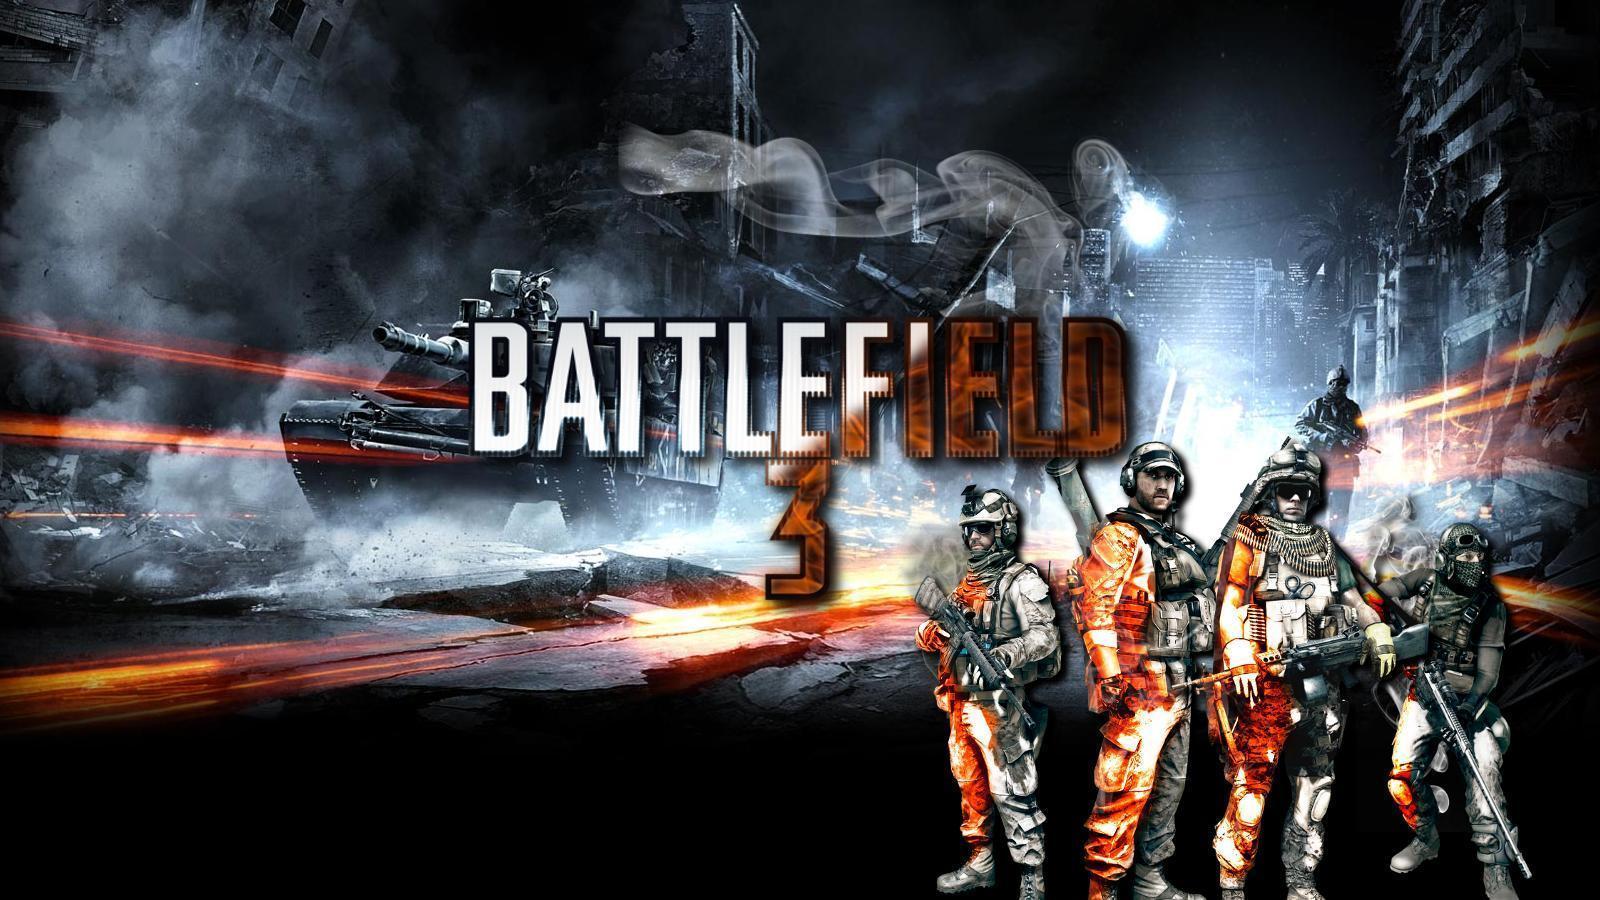 Bf3 wallpaper wallpapersafari - Battlefield 3 hd wallpaper 1080p ...